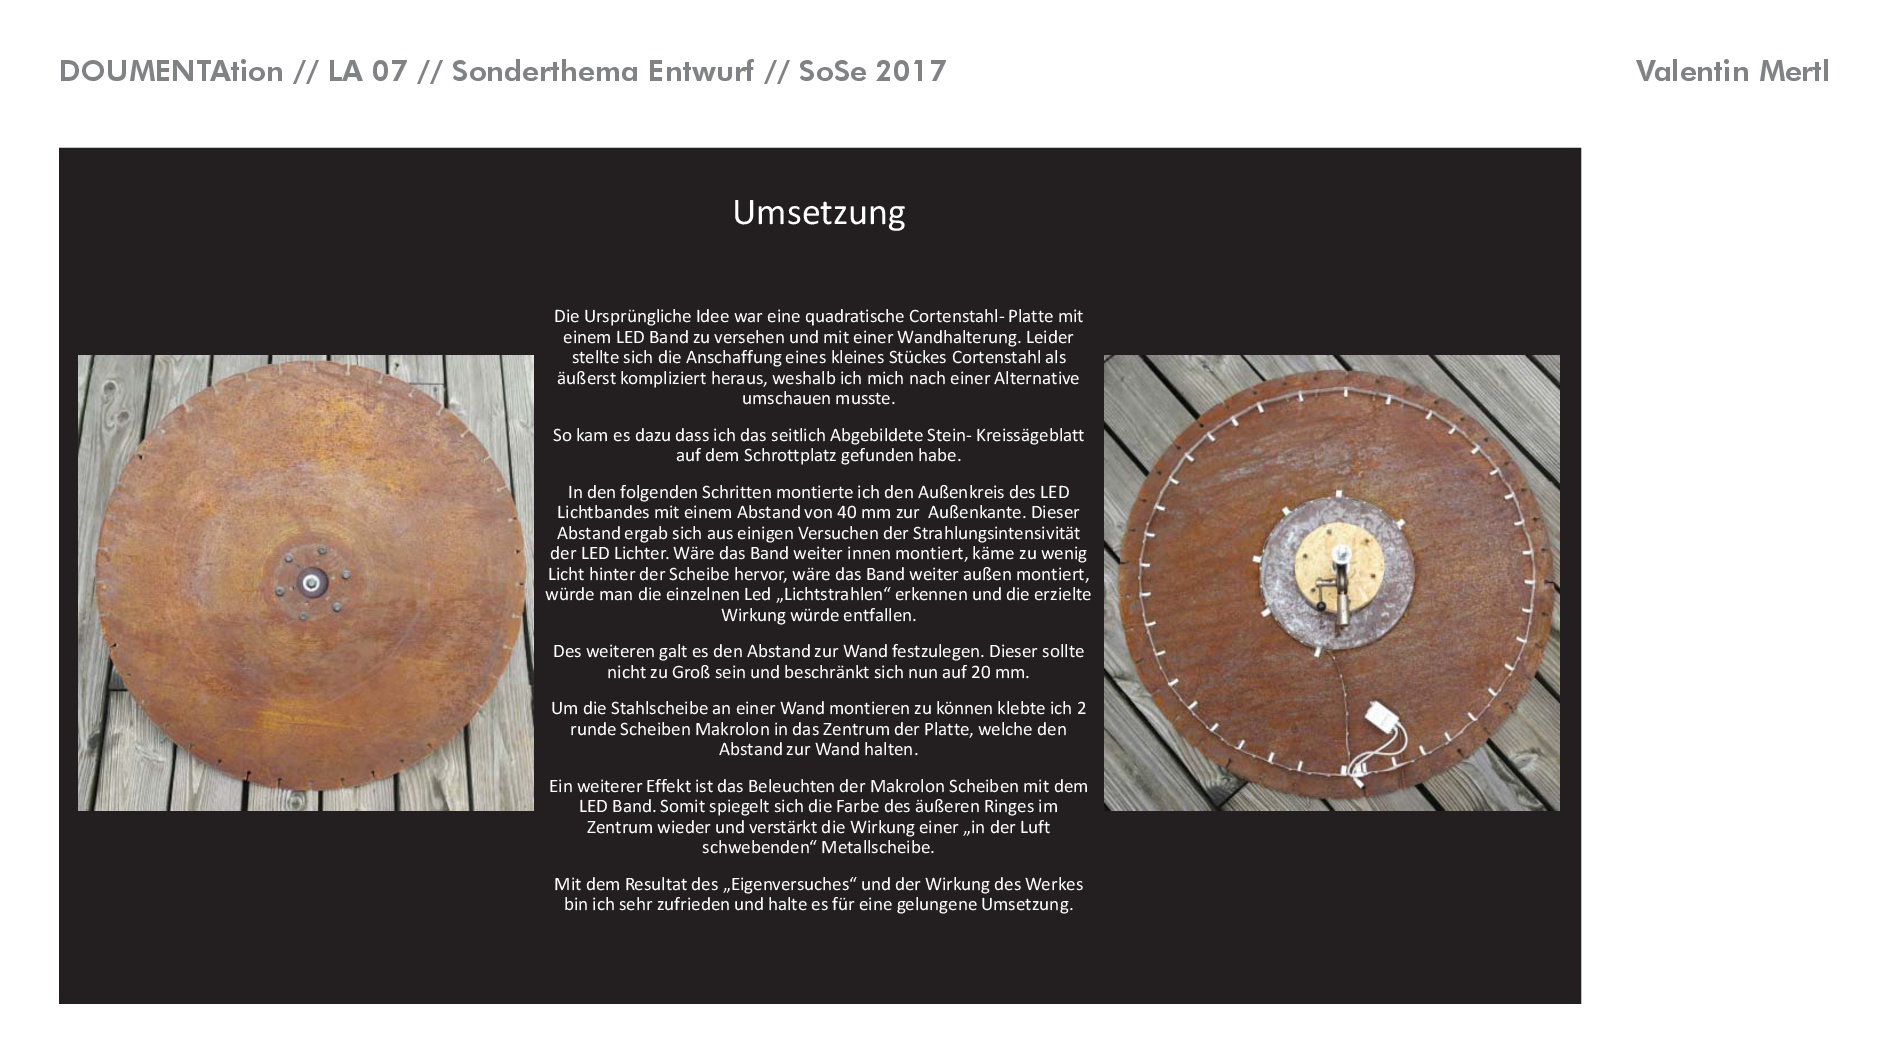 NEU Sonderthema Entwerfen SoSe 17 014